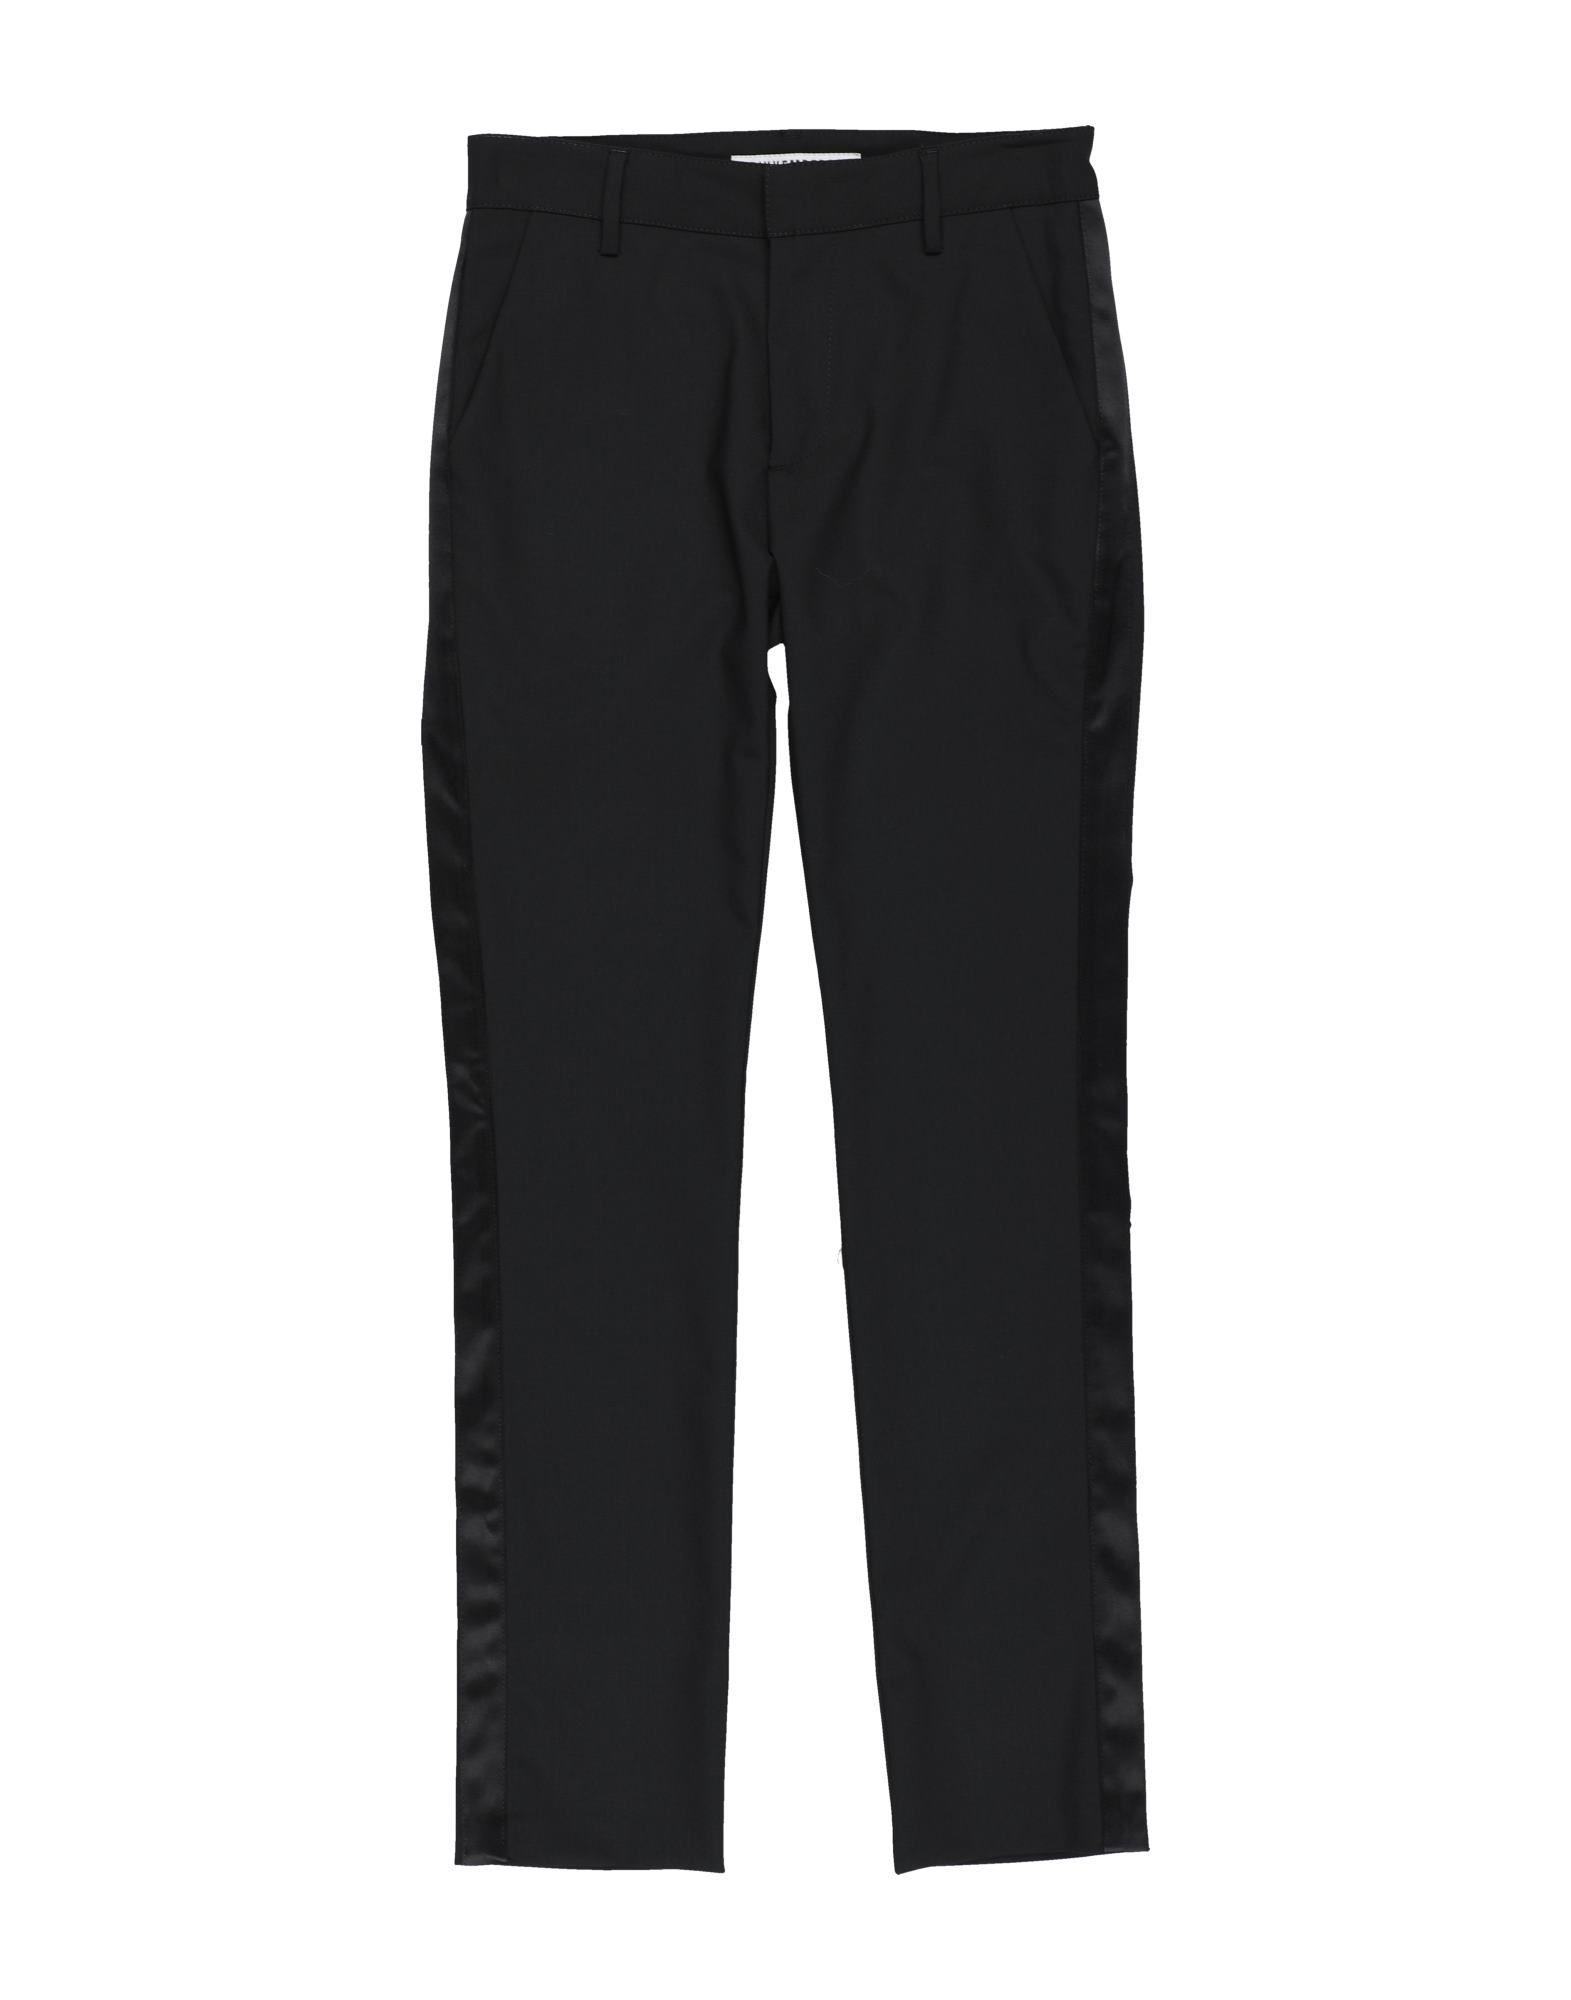 Bikkembergs Kids' Casual Pants In Black